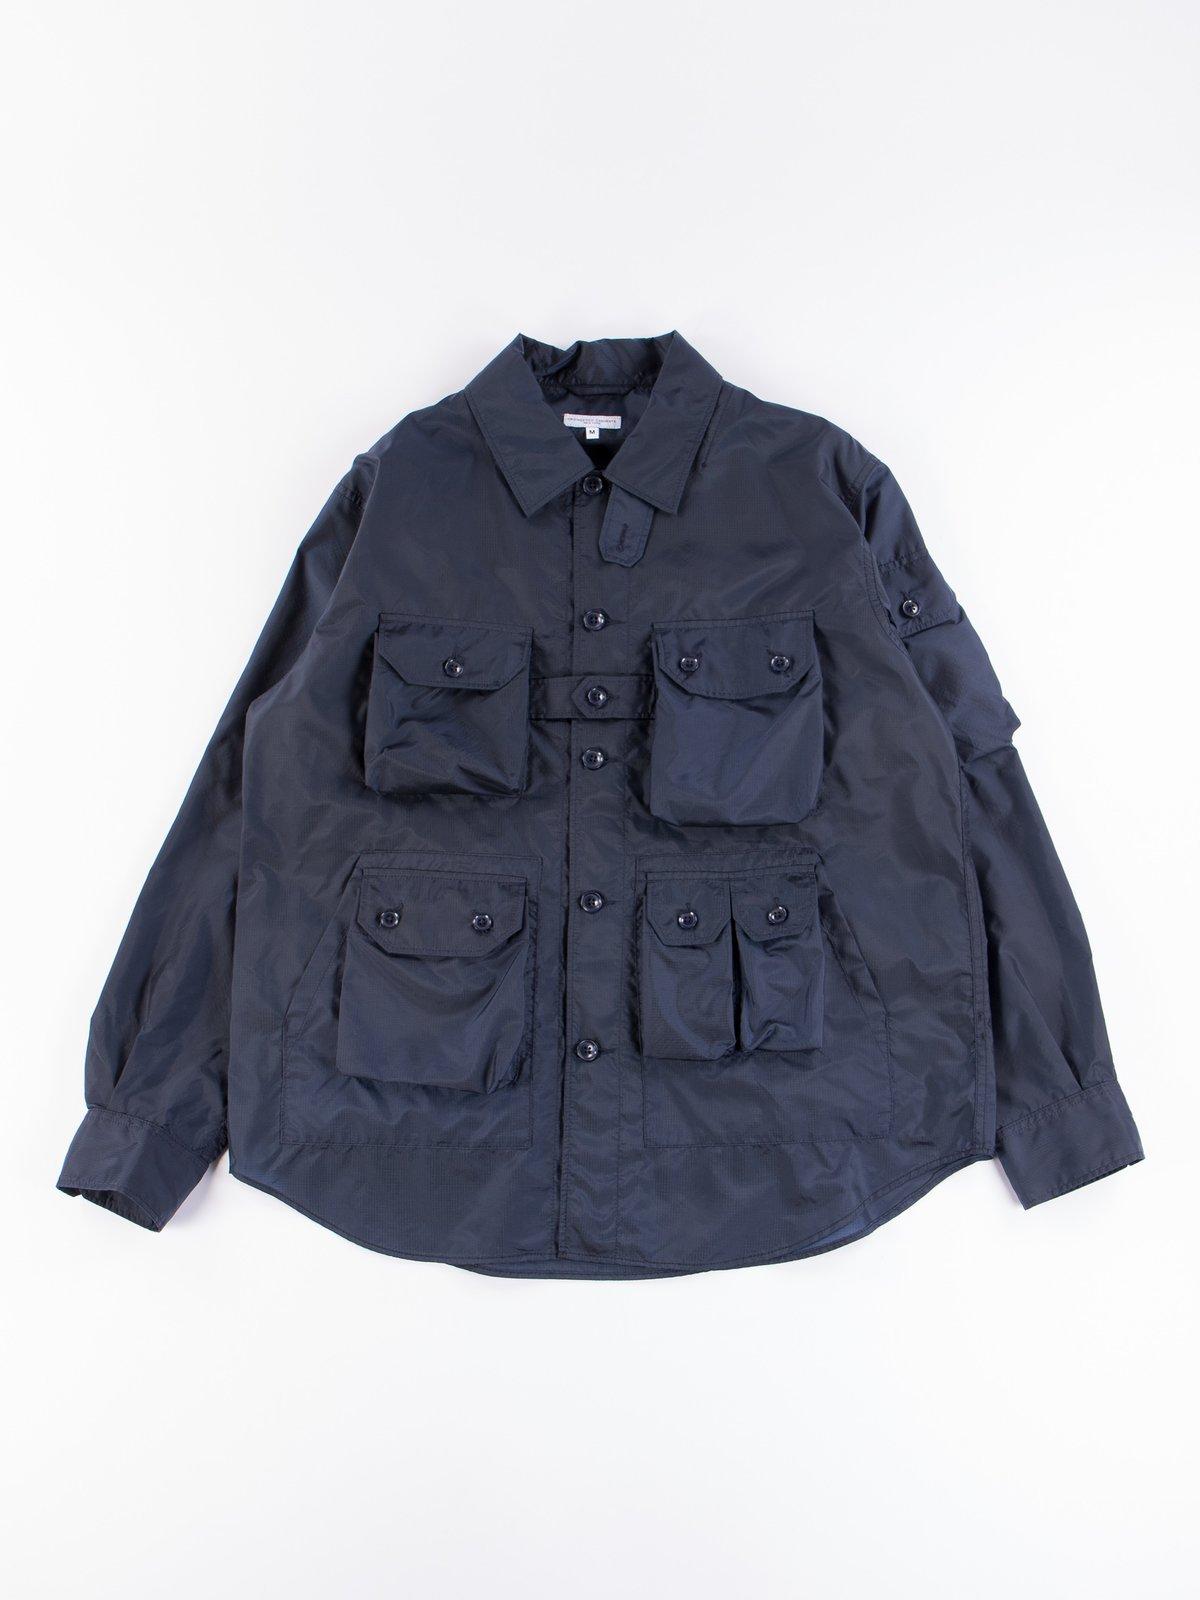 Navy Nylon Micro Ripstop Explorer Shirt Jacket  - Image 1